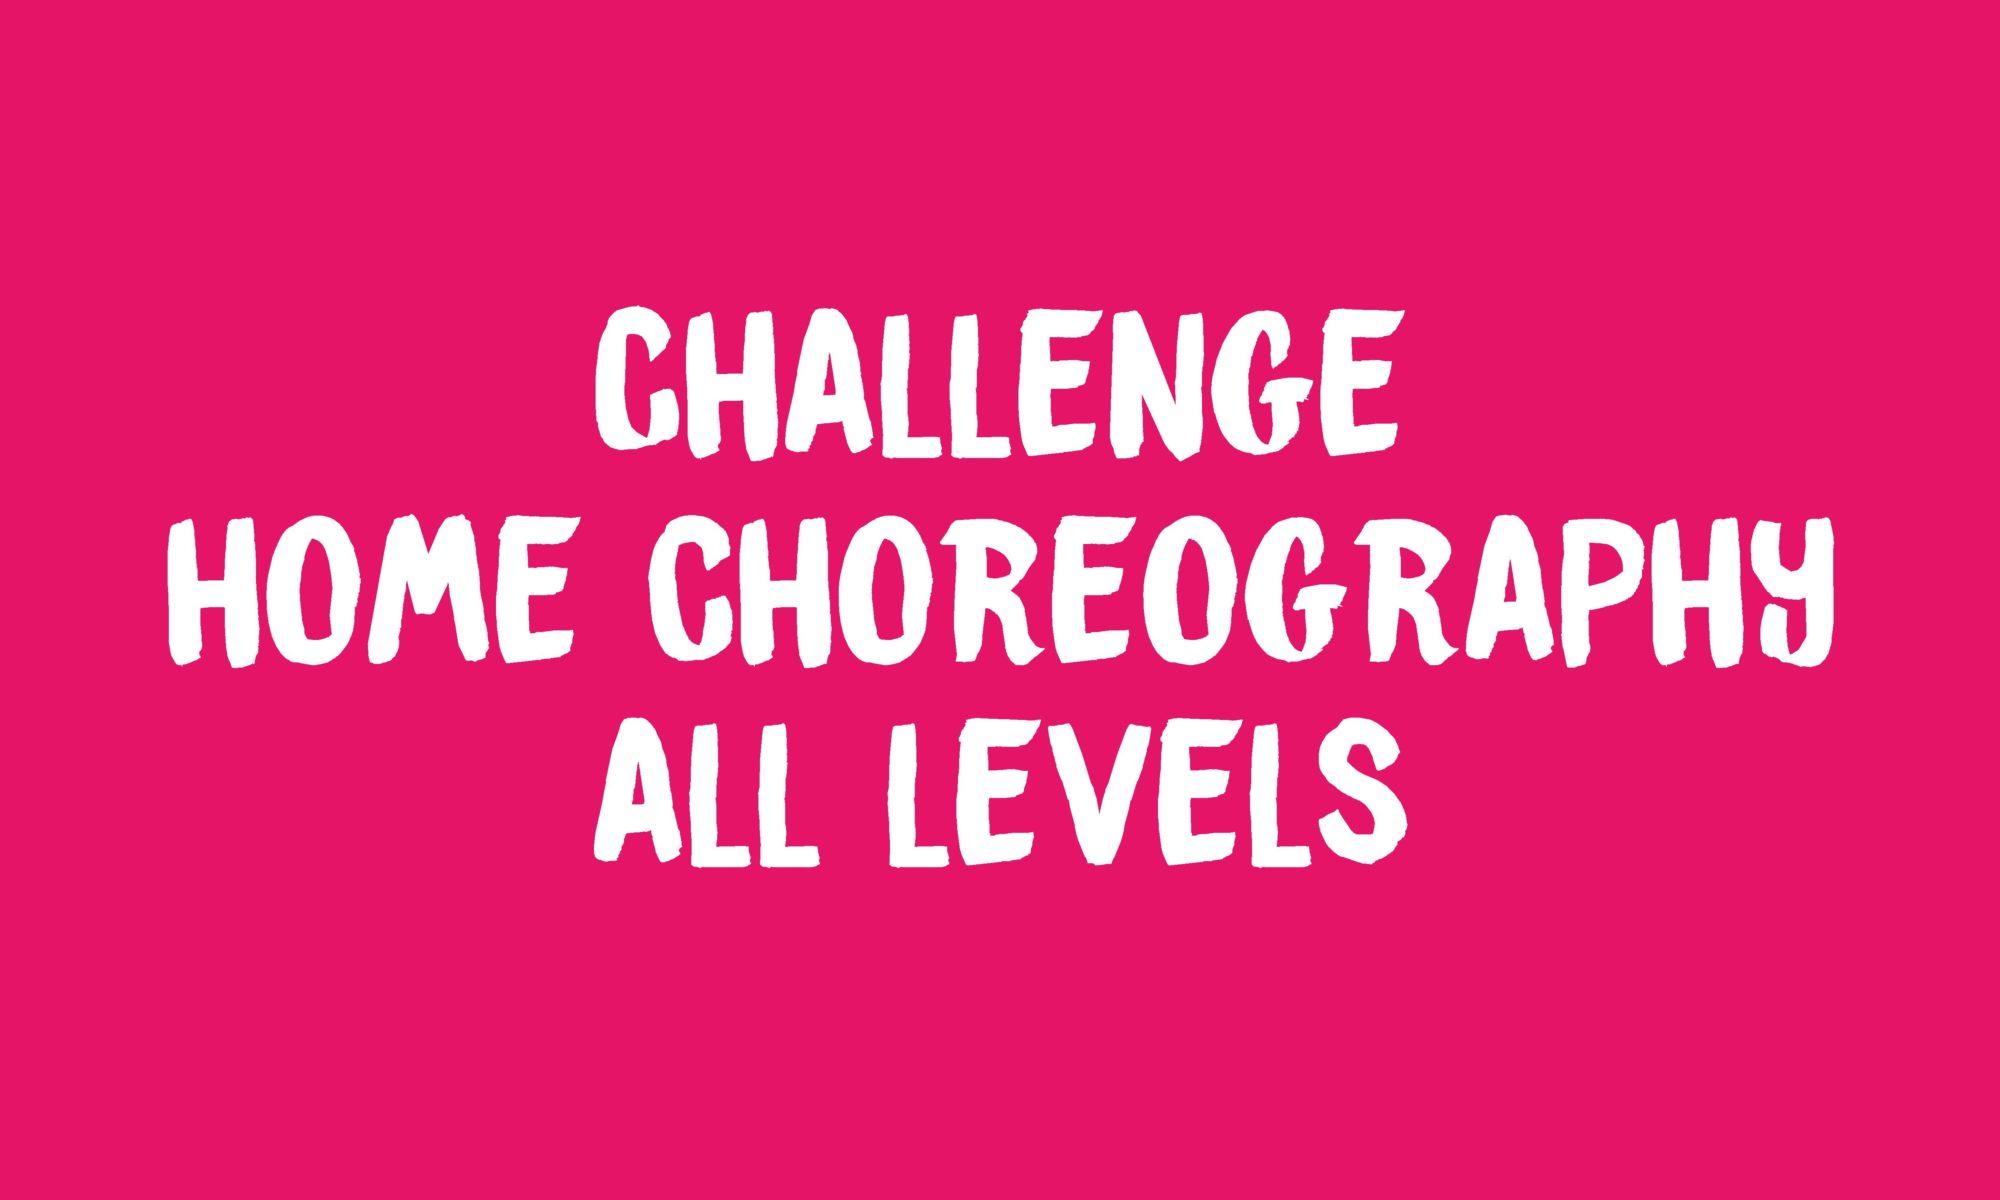 Challenge Home Choreography Banner